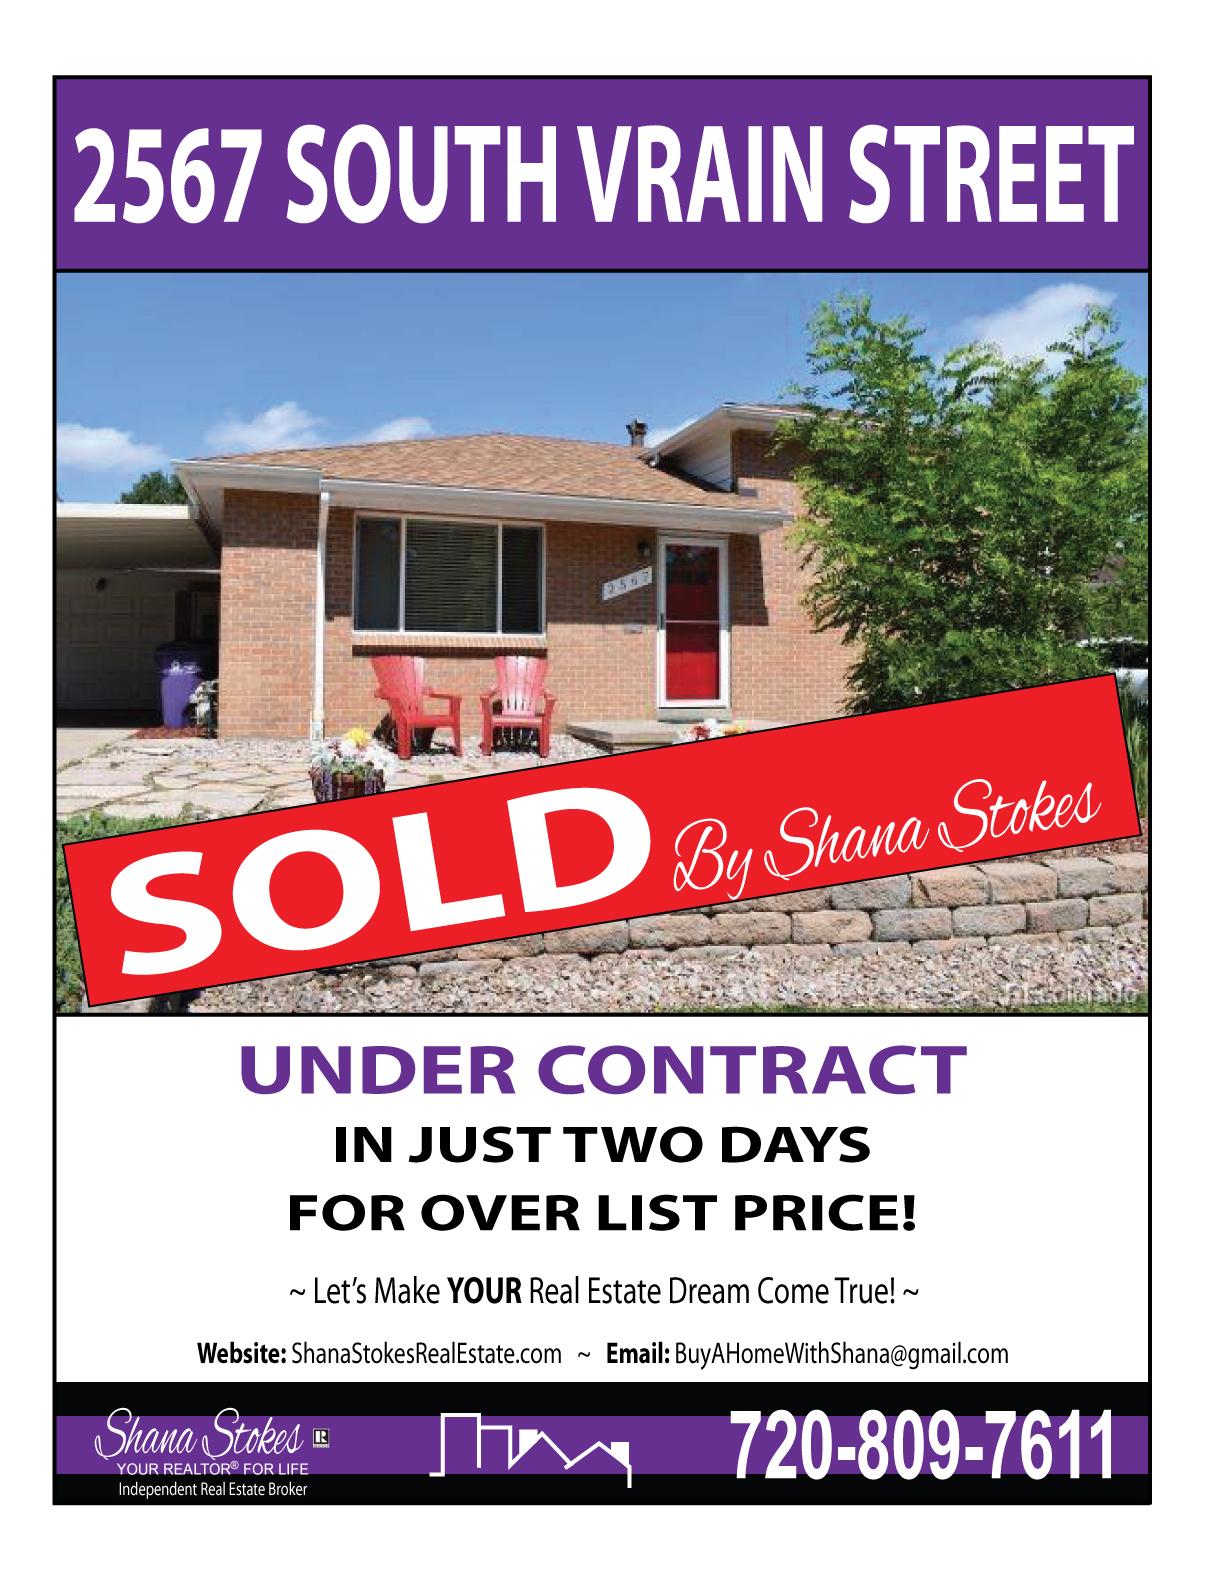 2567 S Vrain, Denver CO is SOLD!